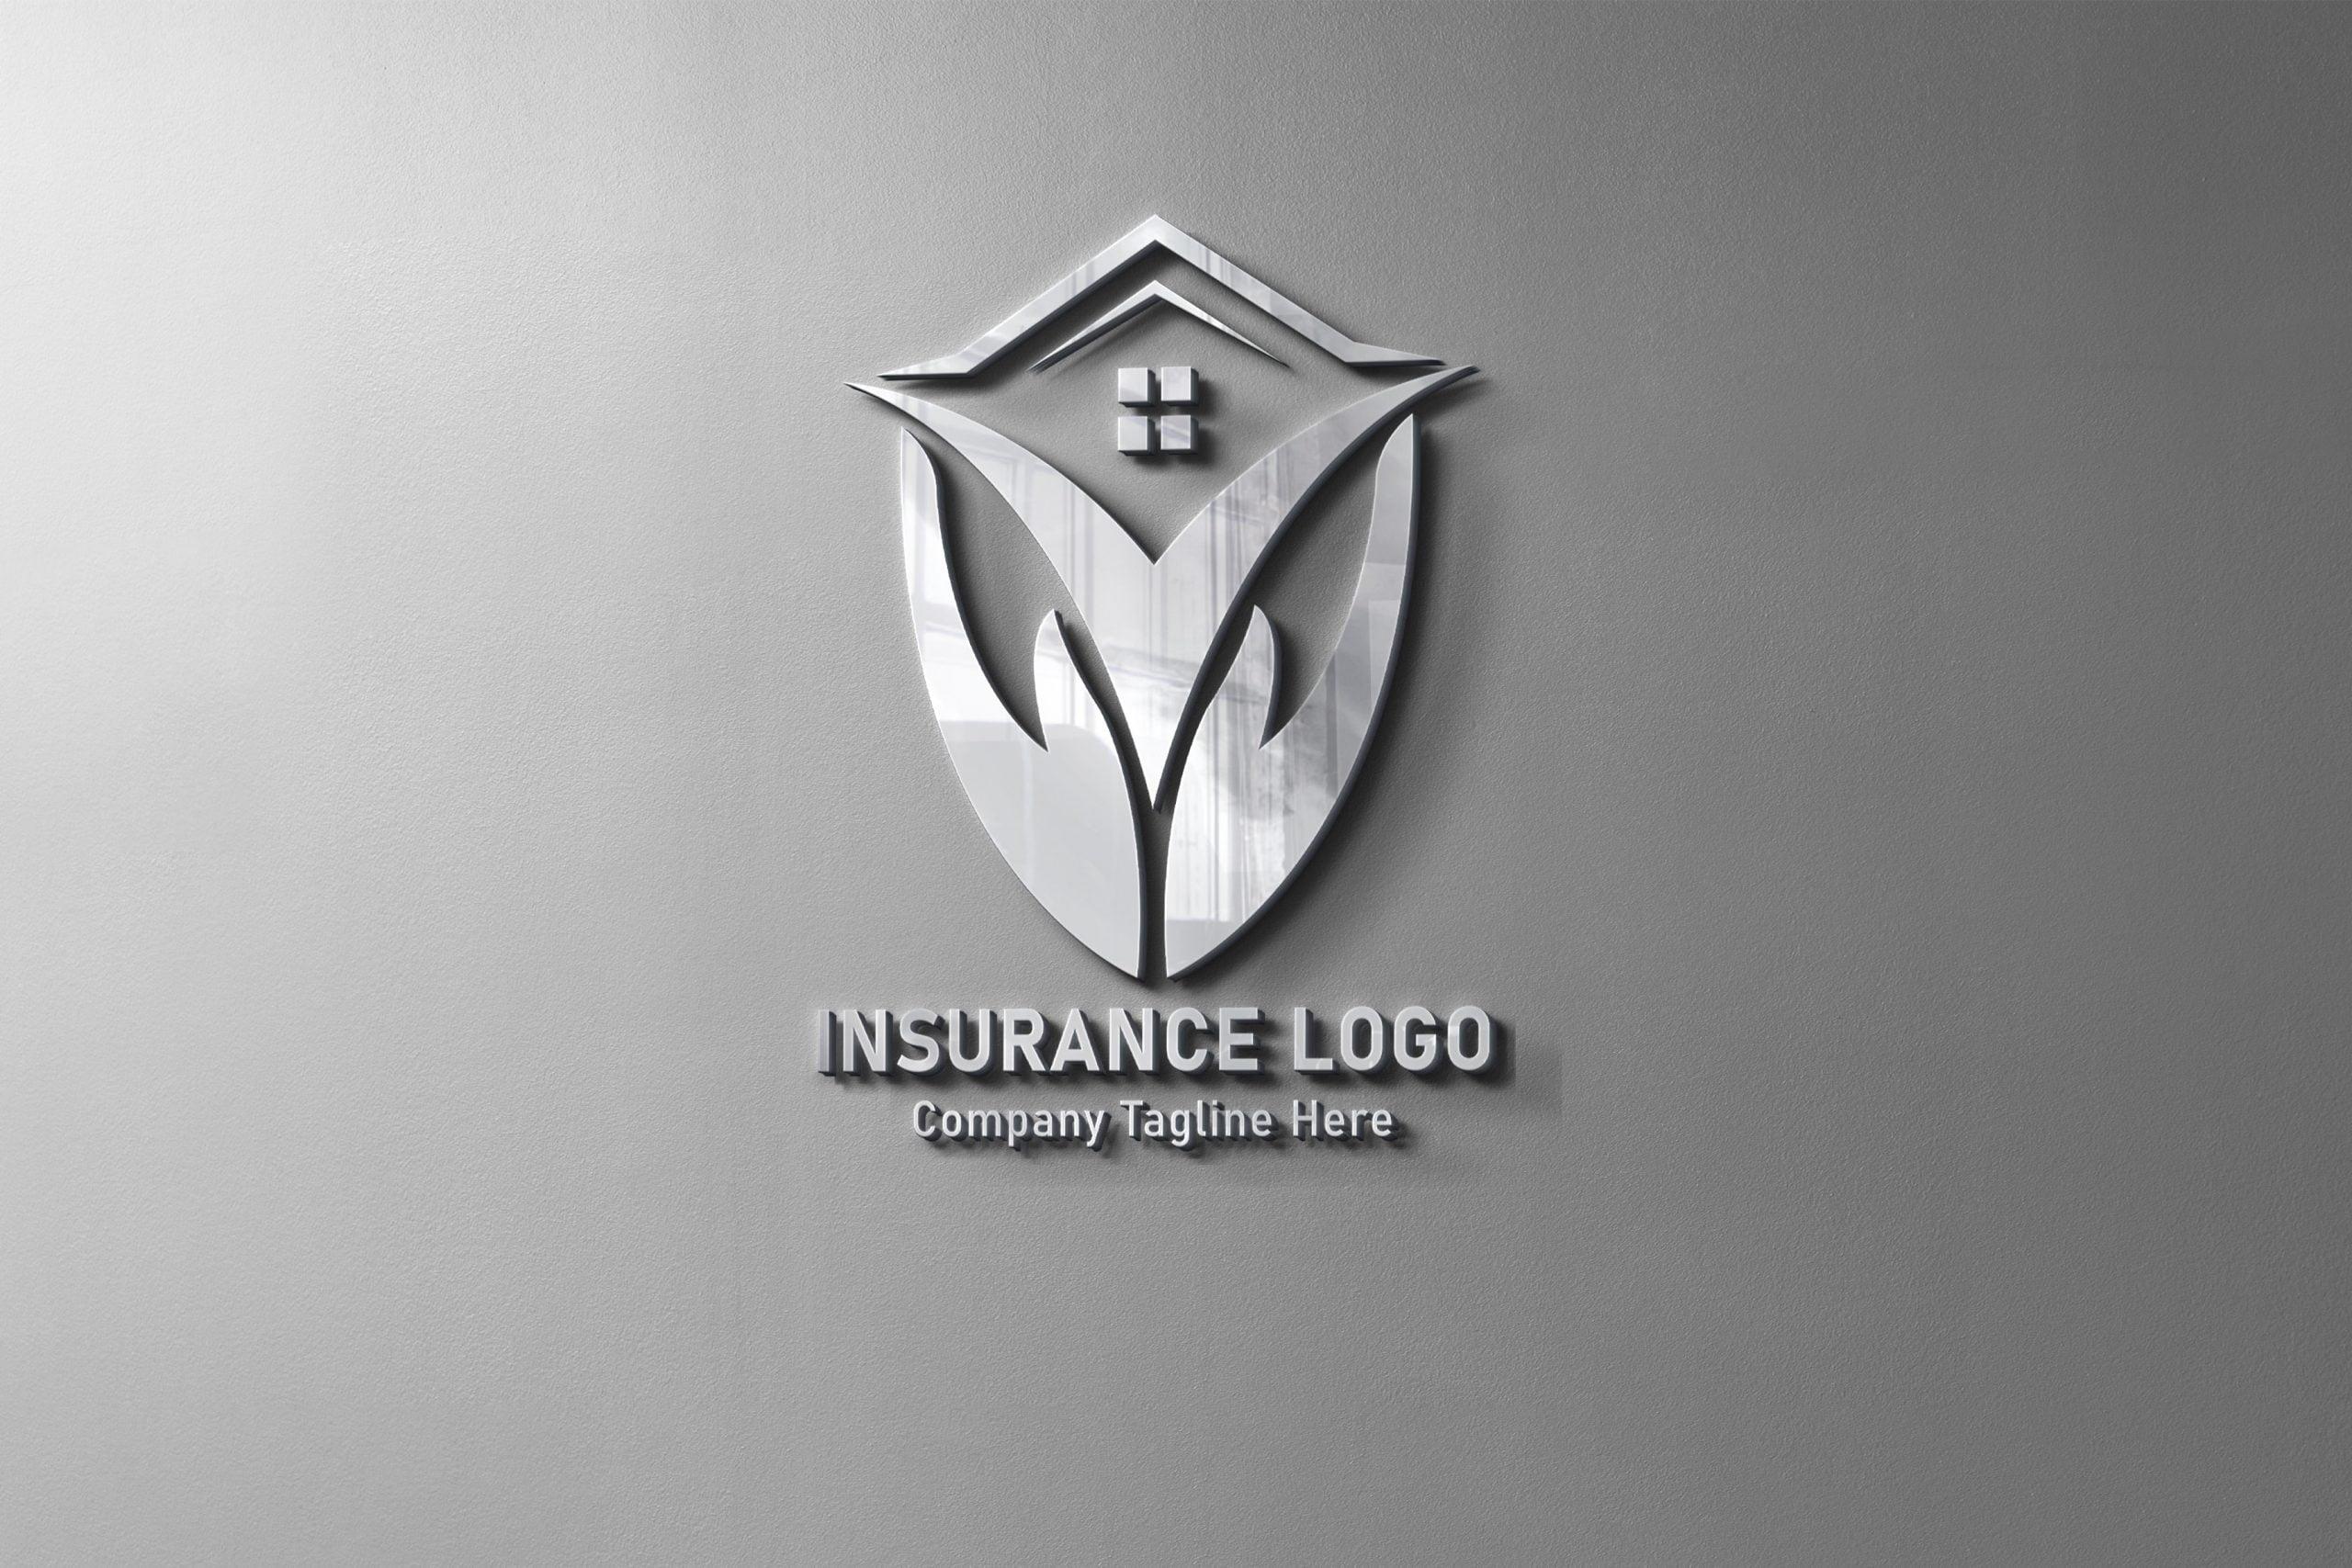 Finance & Insurance Logo Design on metal wall